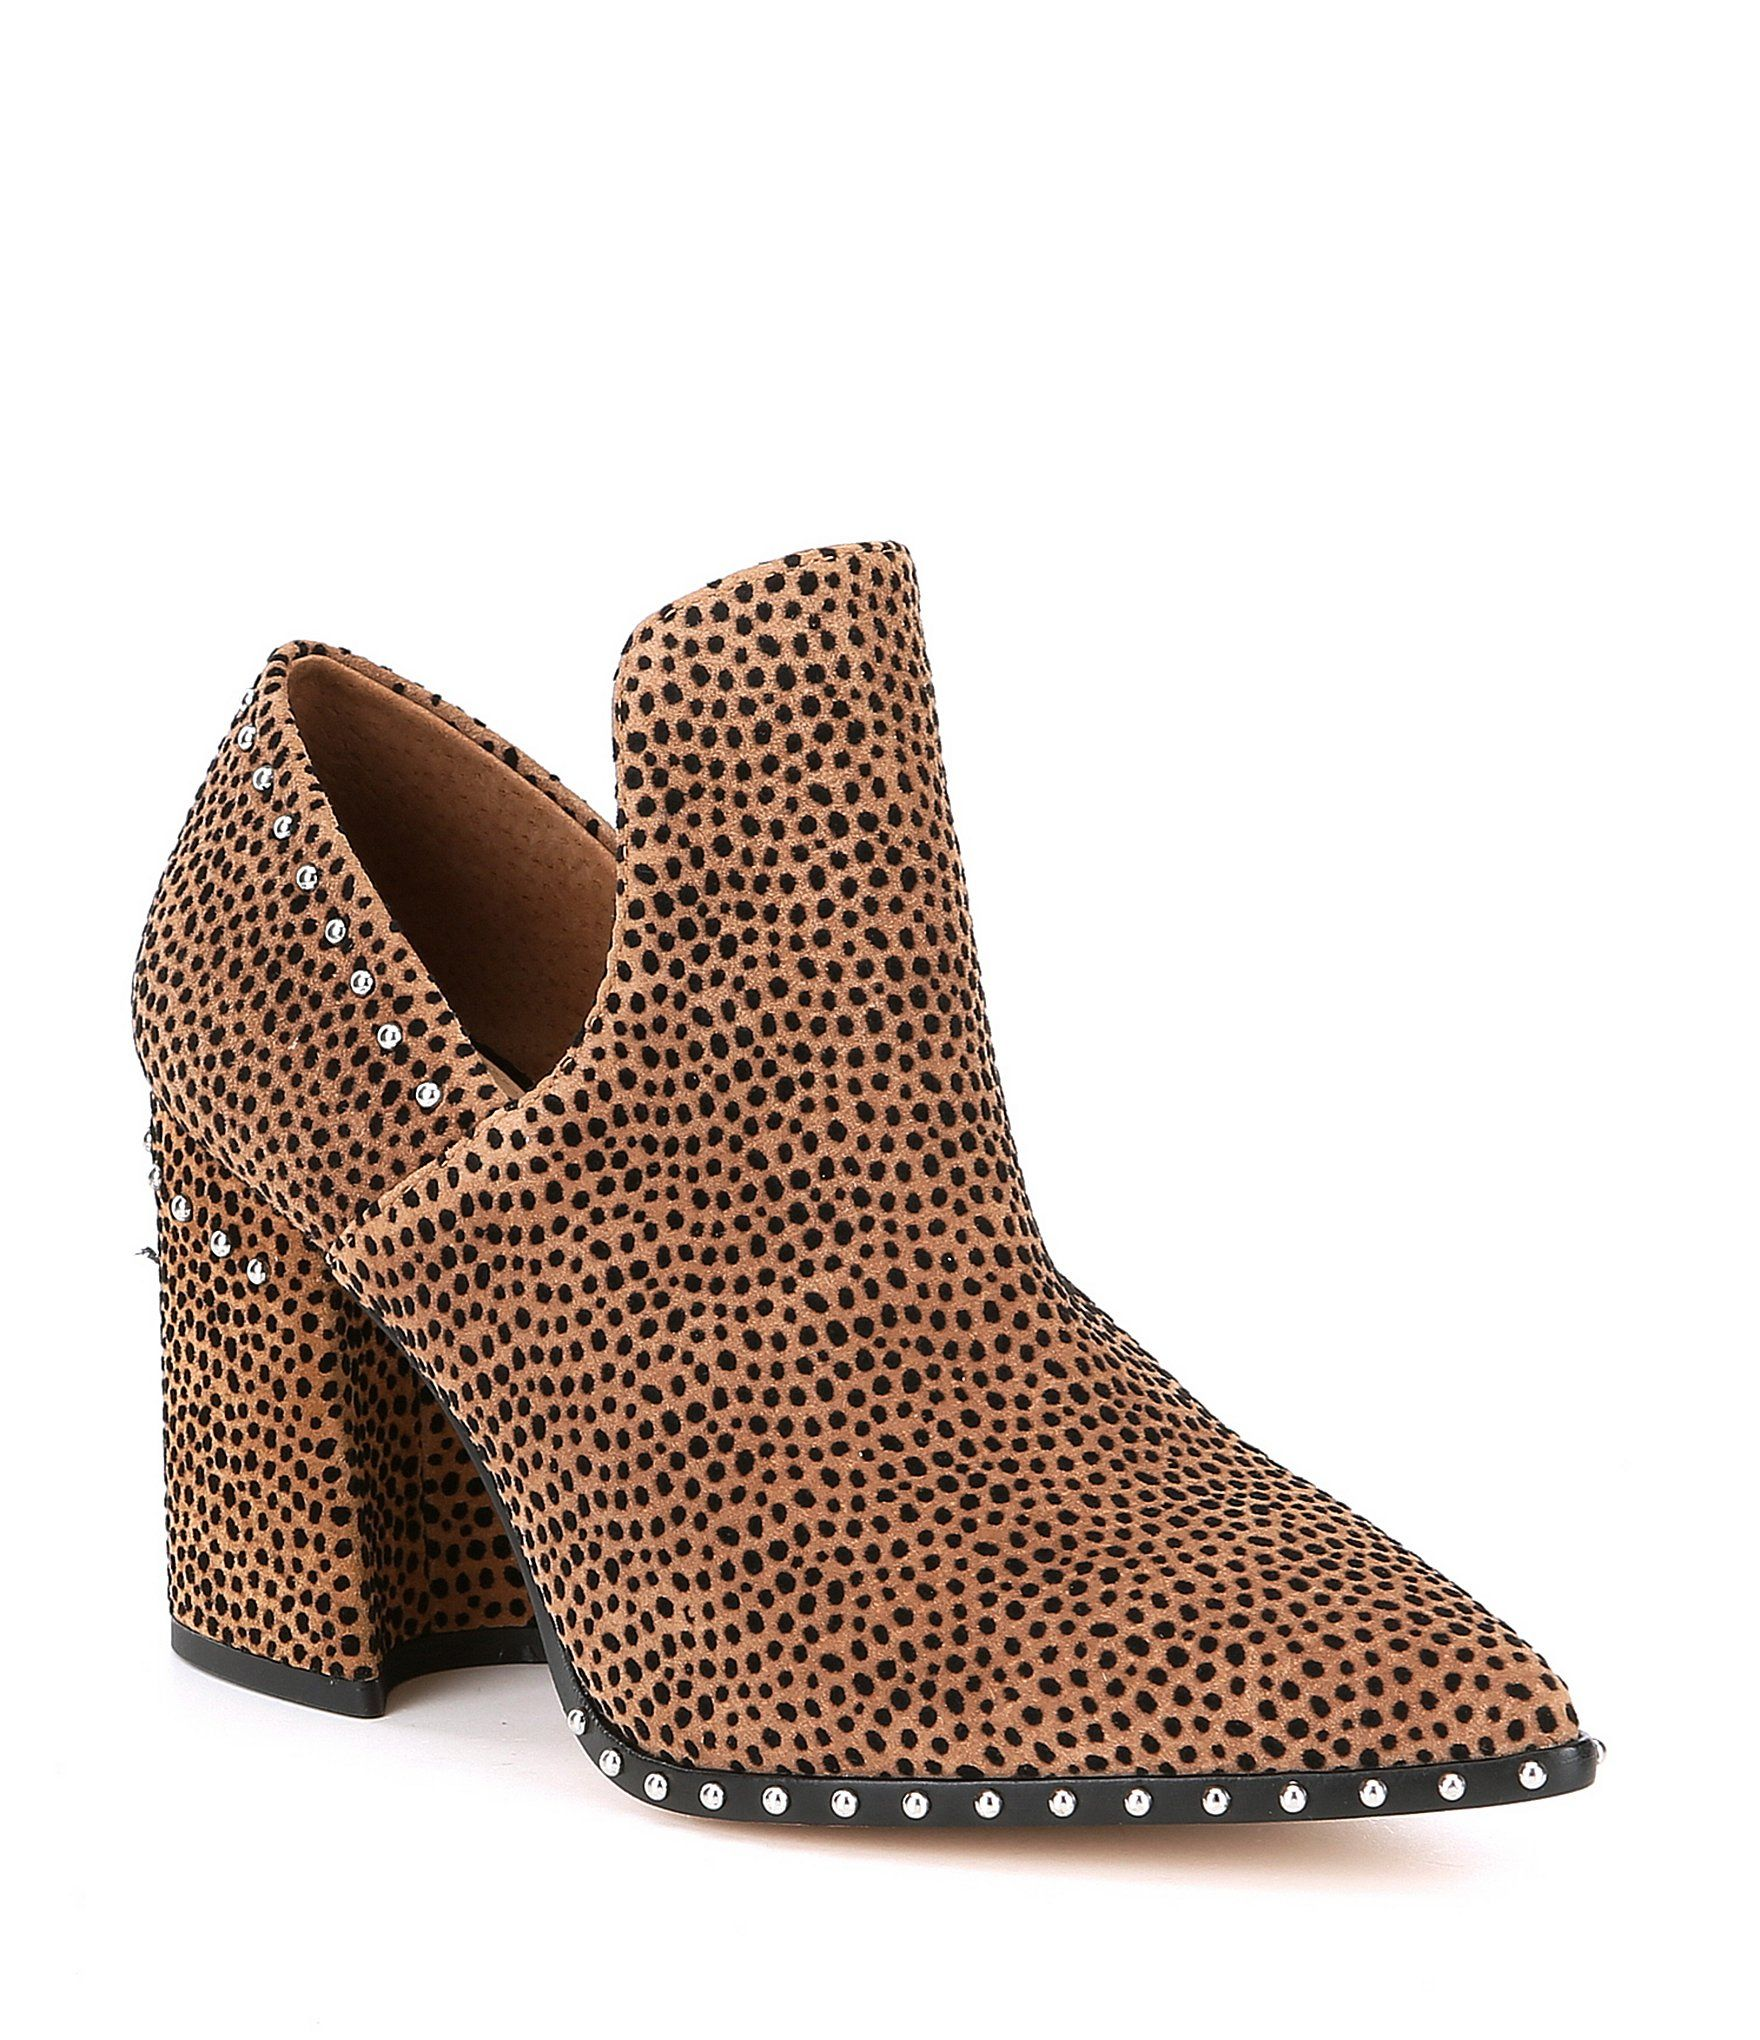 35b8f052ec6c9 Gianni Bini Daveigh Cheetah Print Suede Studded Western Block Heel ...